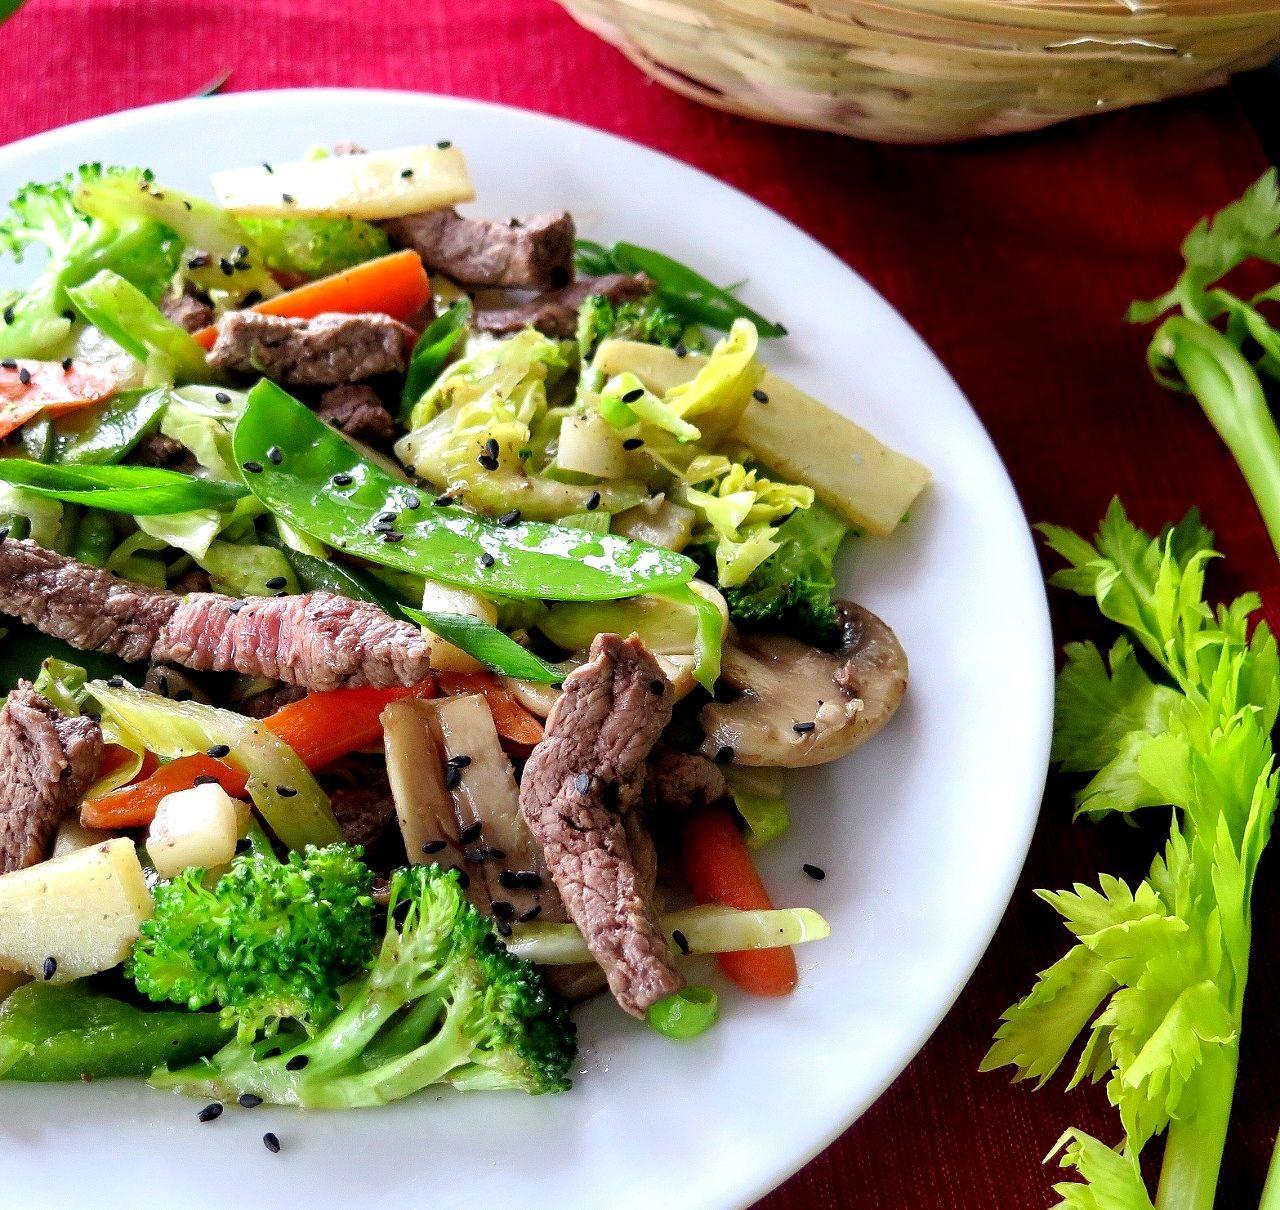 Beef Vegetable Stir Fry Sundaysupper Recipe Beef Vegetable Stir Fry Vegetable Stir Fry Recipe Food Guide